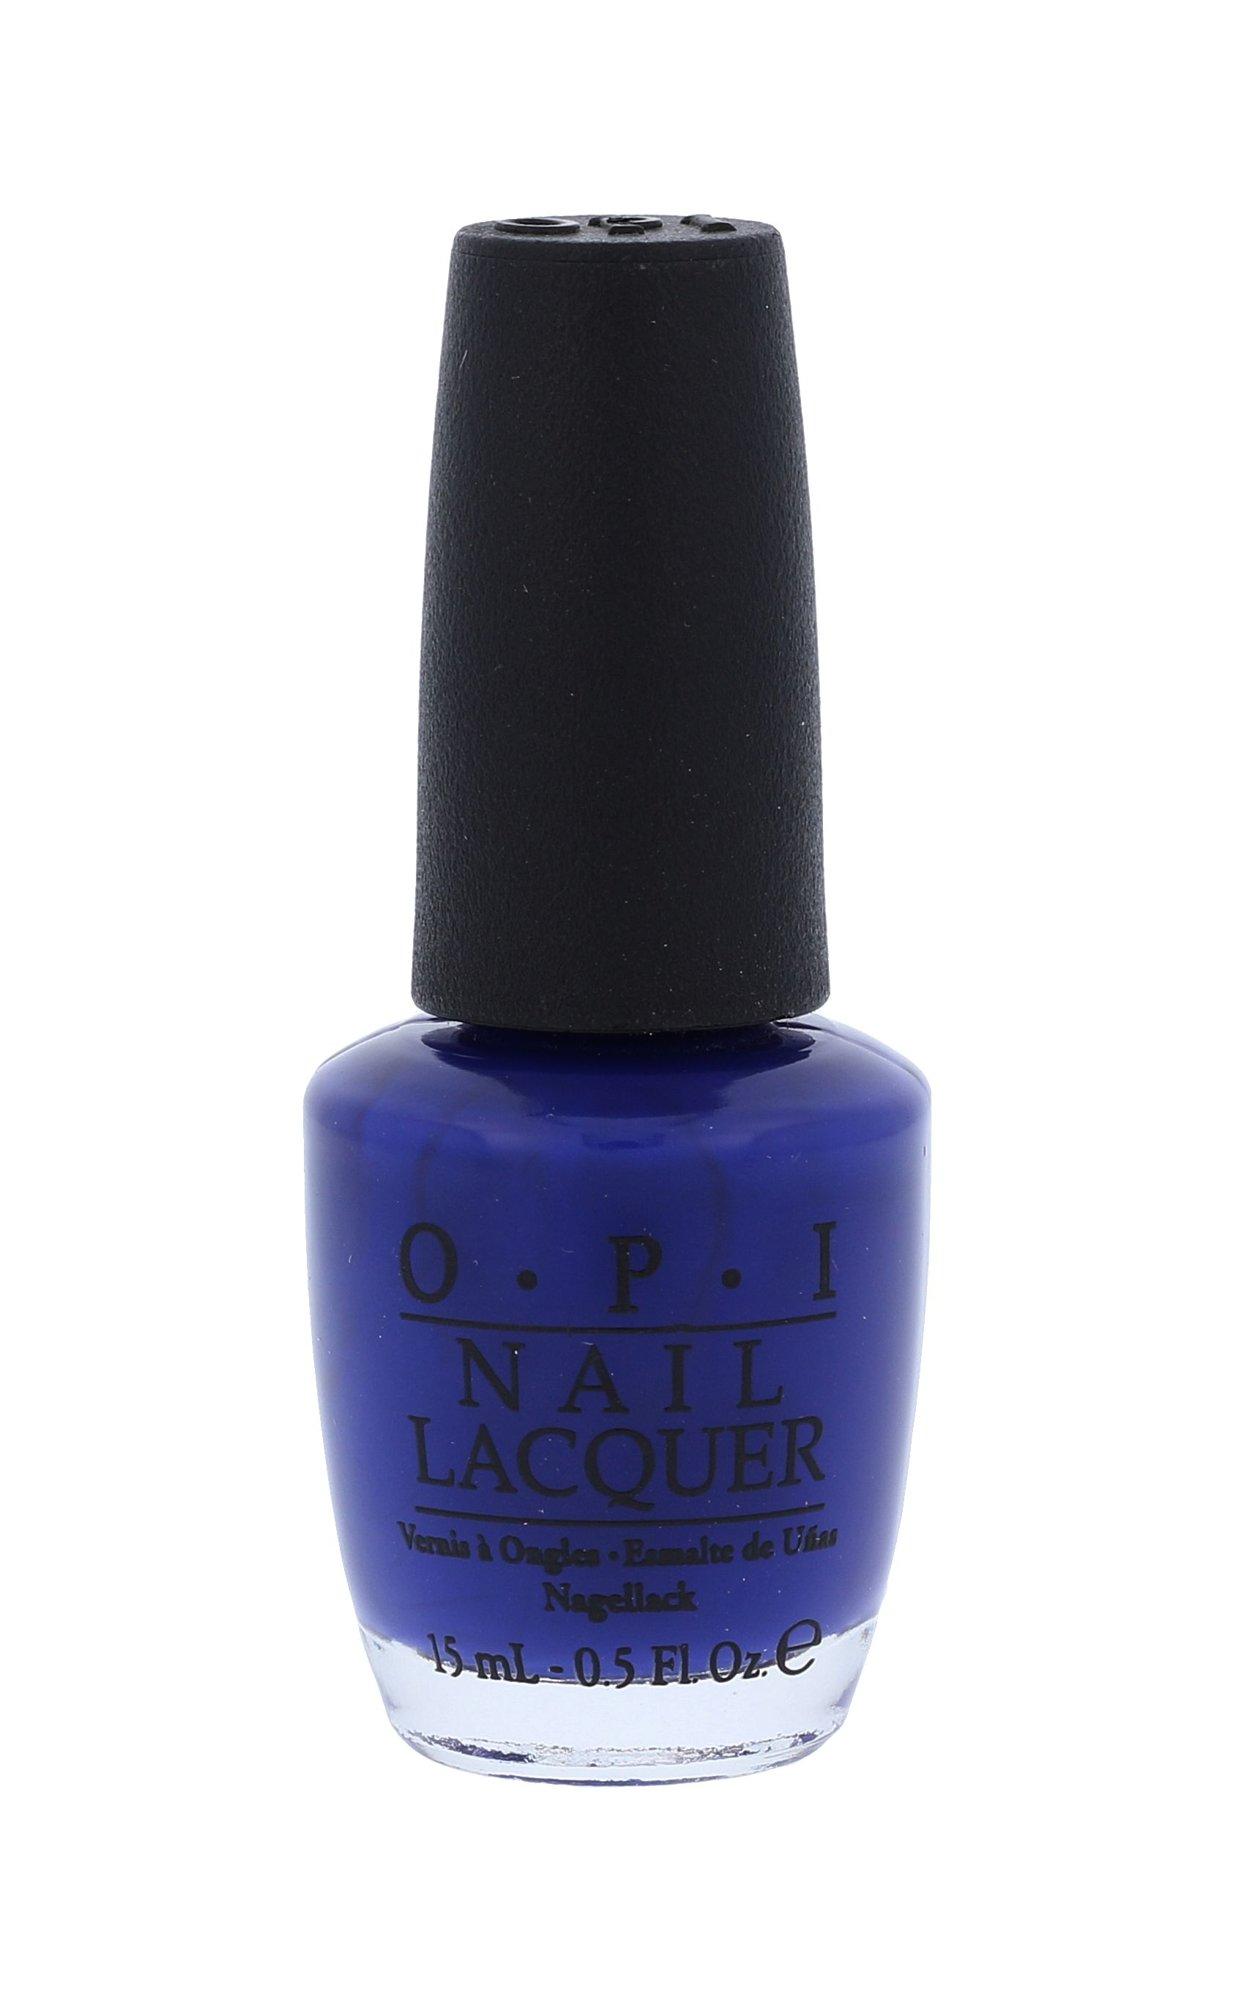 OPI Nail Lacquer Cosmetic 15ml NL E72 Opi Eurso Euro